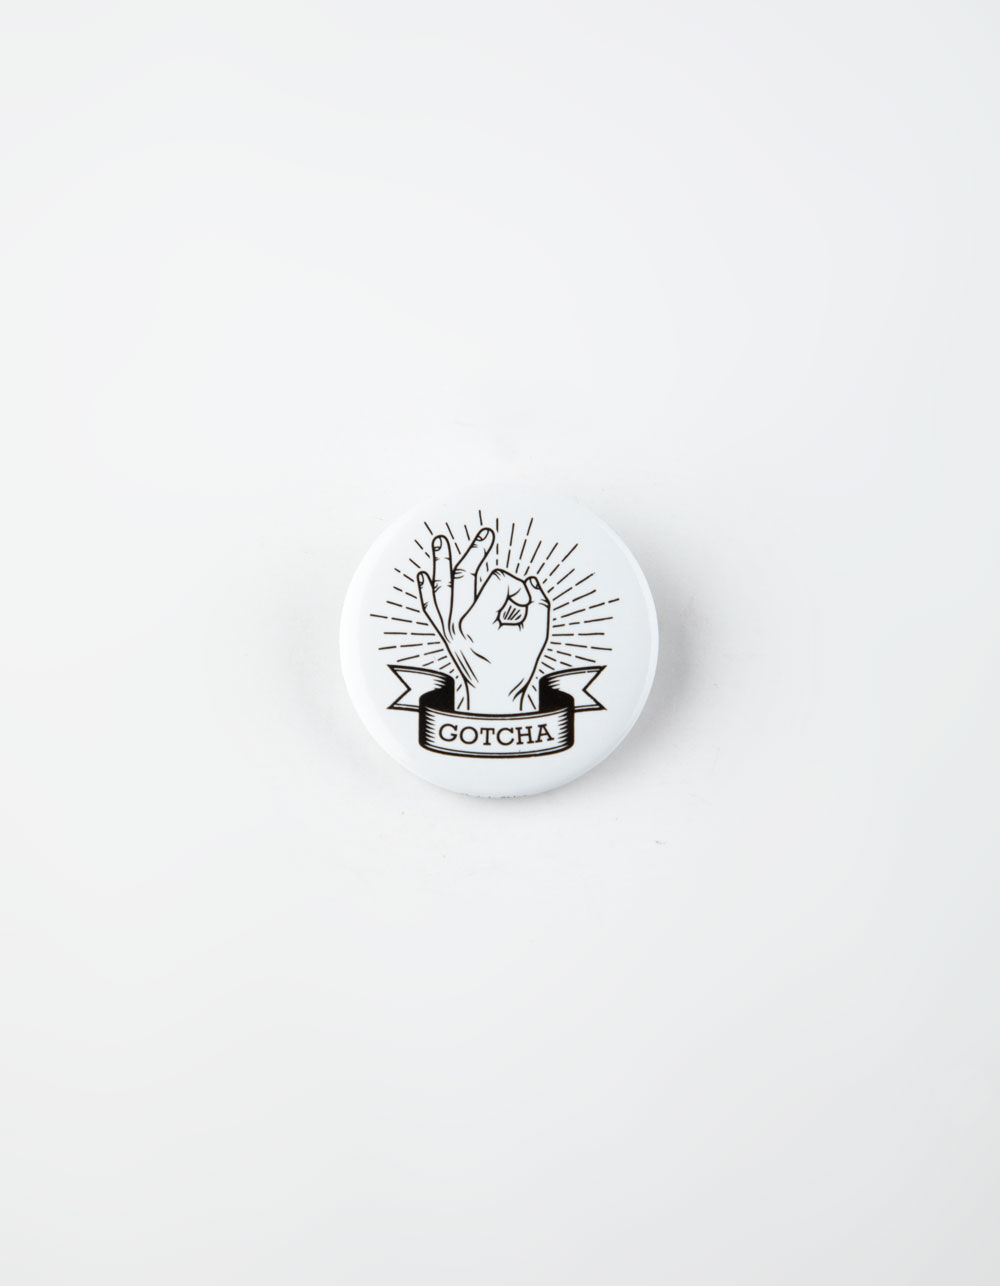 Image of GOTCHA HAND PIN